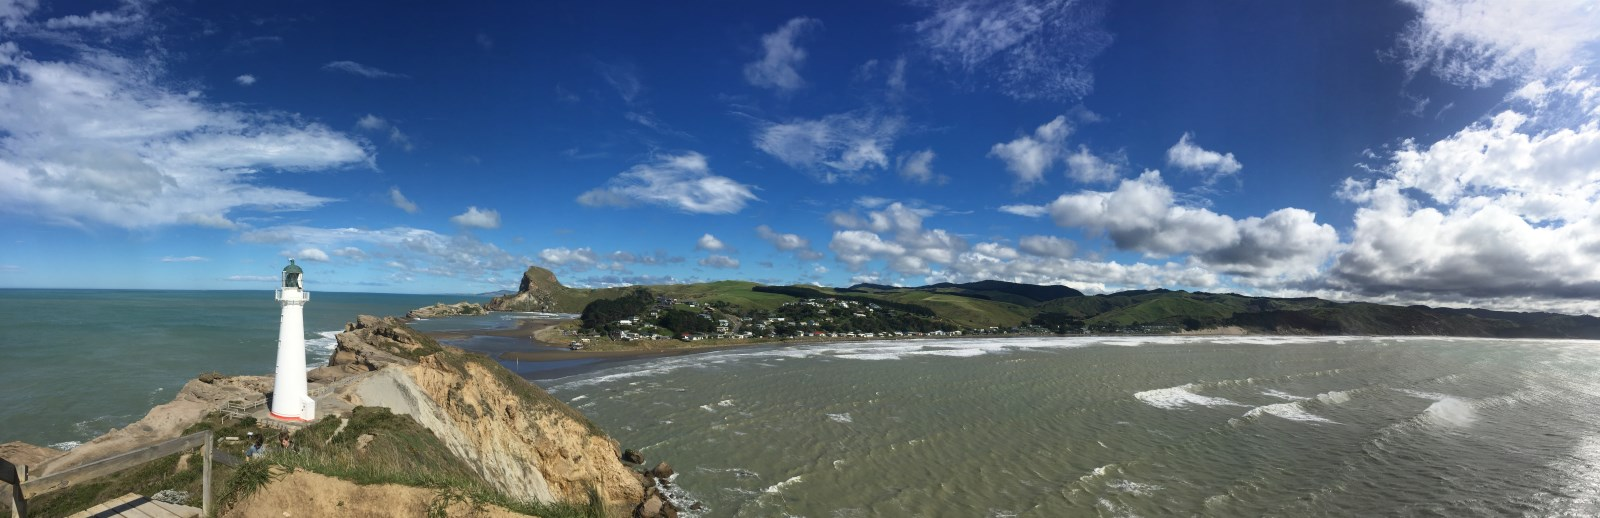 Panorama of Coastal NZ - Castlepoint Lighthouse